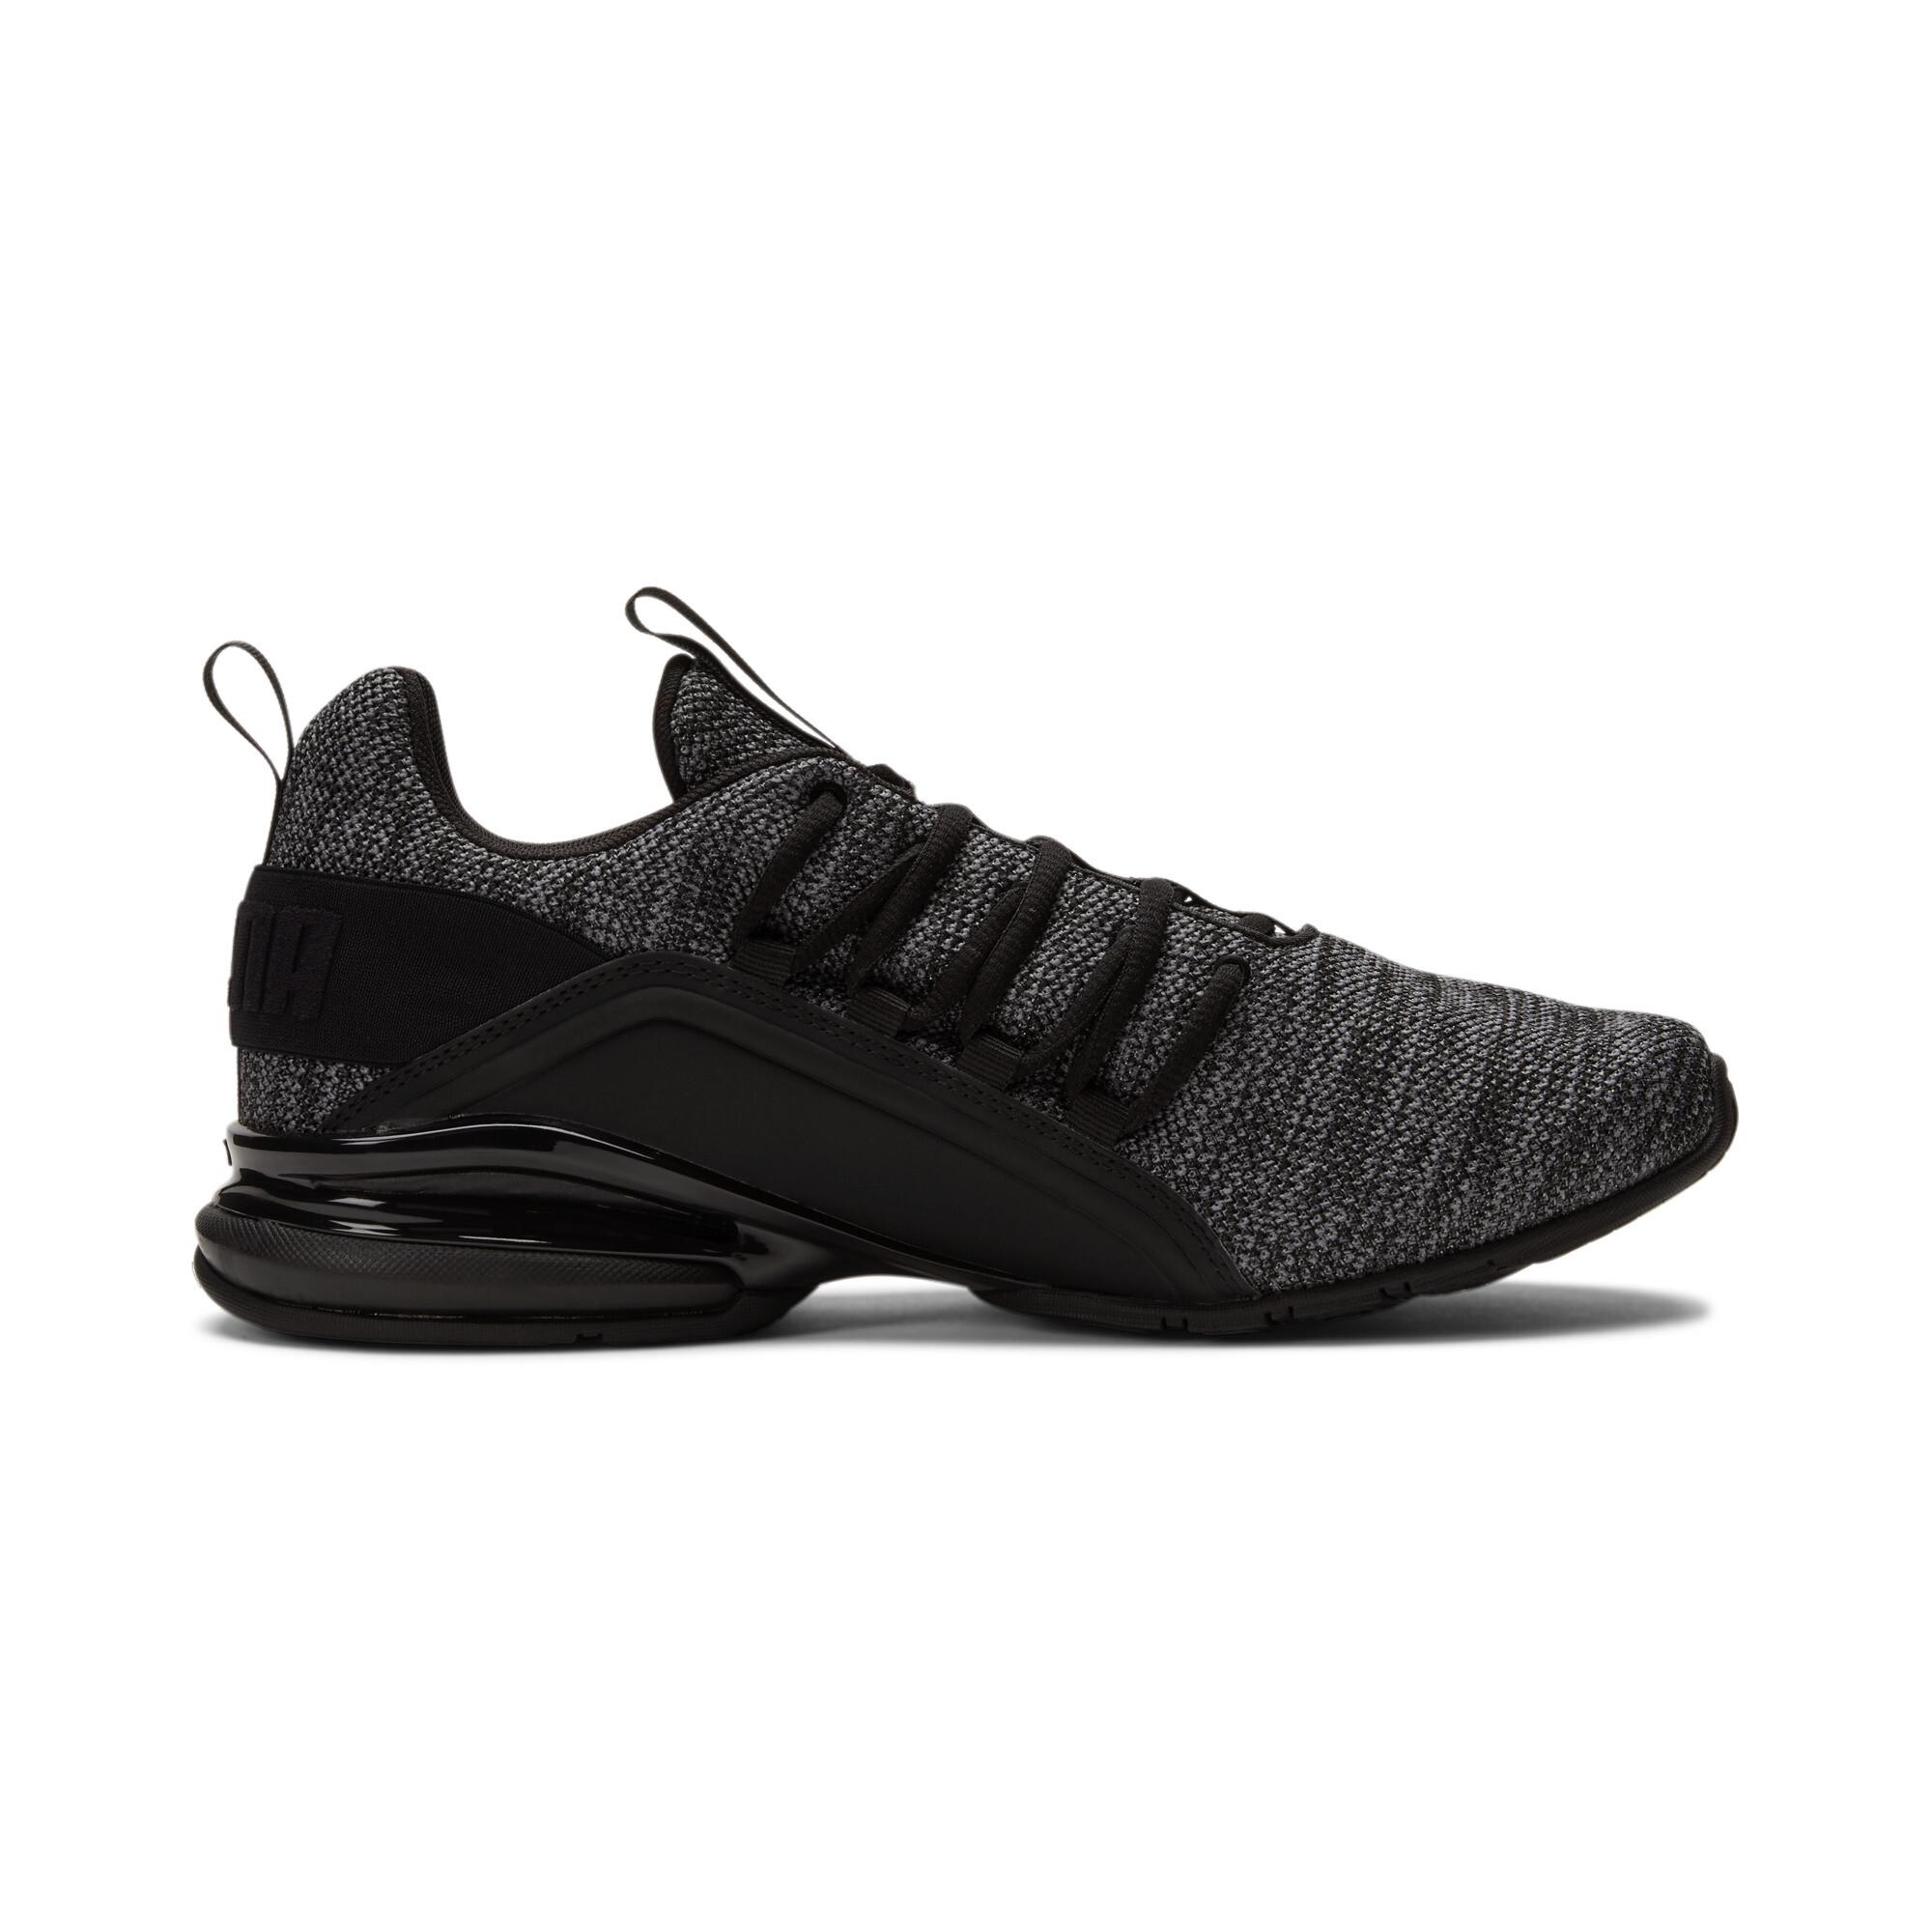 PUMA-Axelion-Men-039-s-Training-Shoes-Men-Shoe-Running thumbnail 8